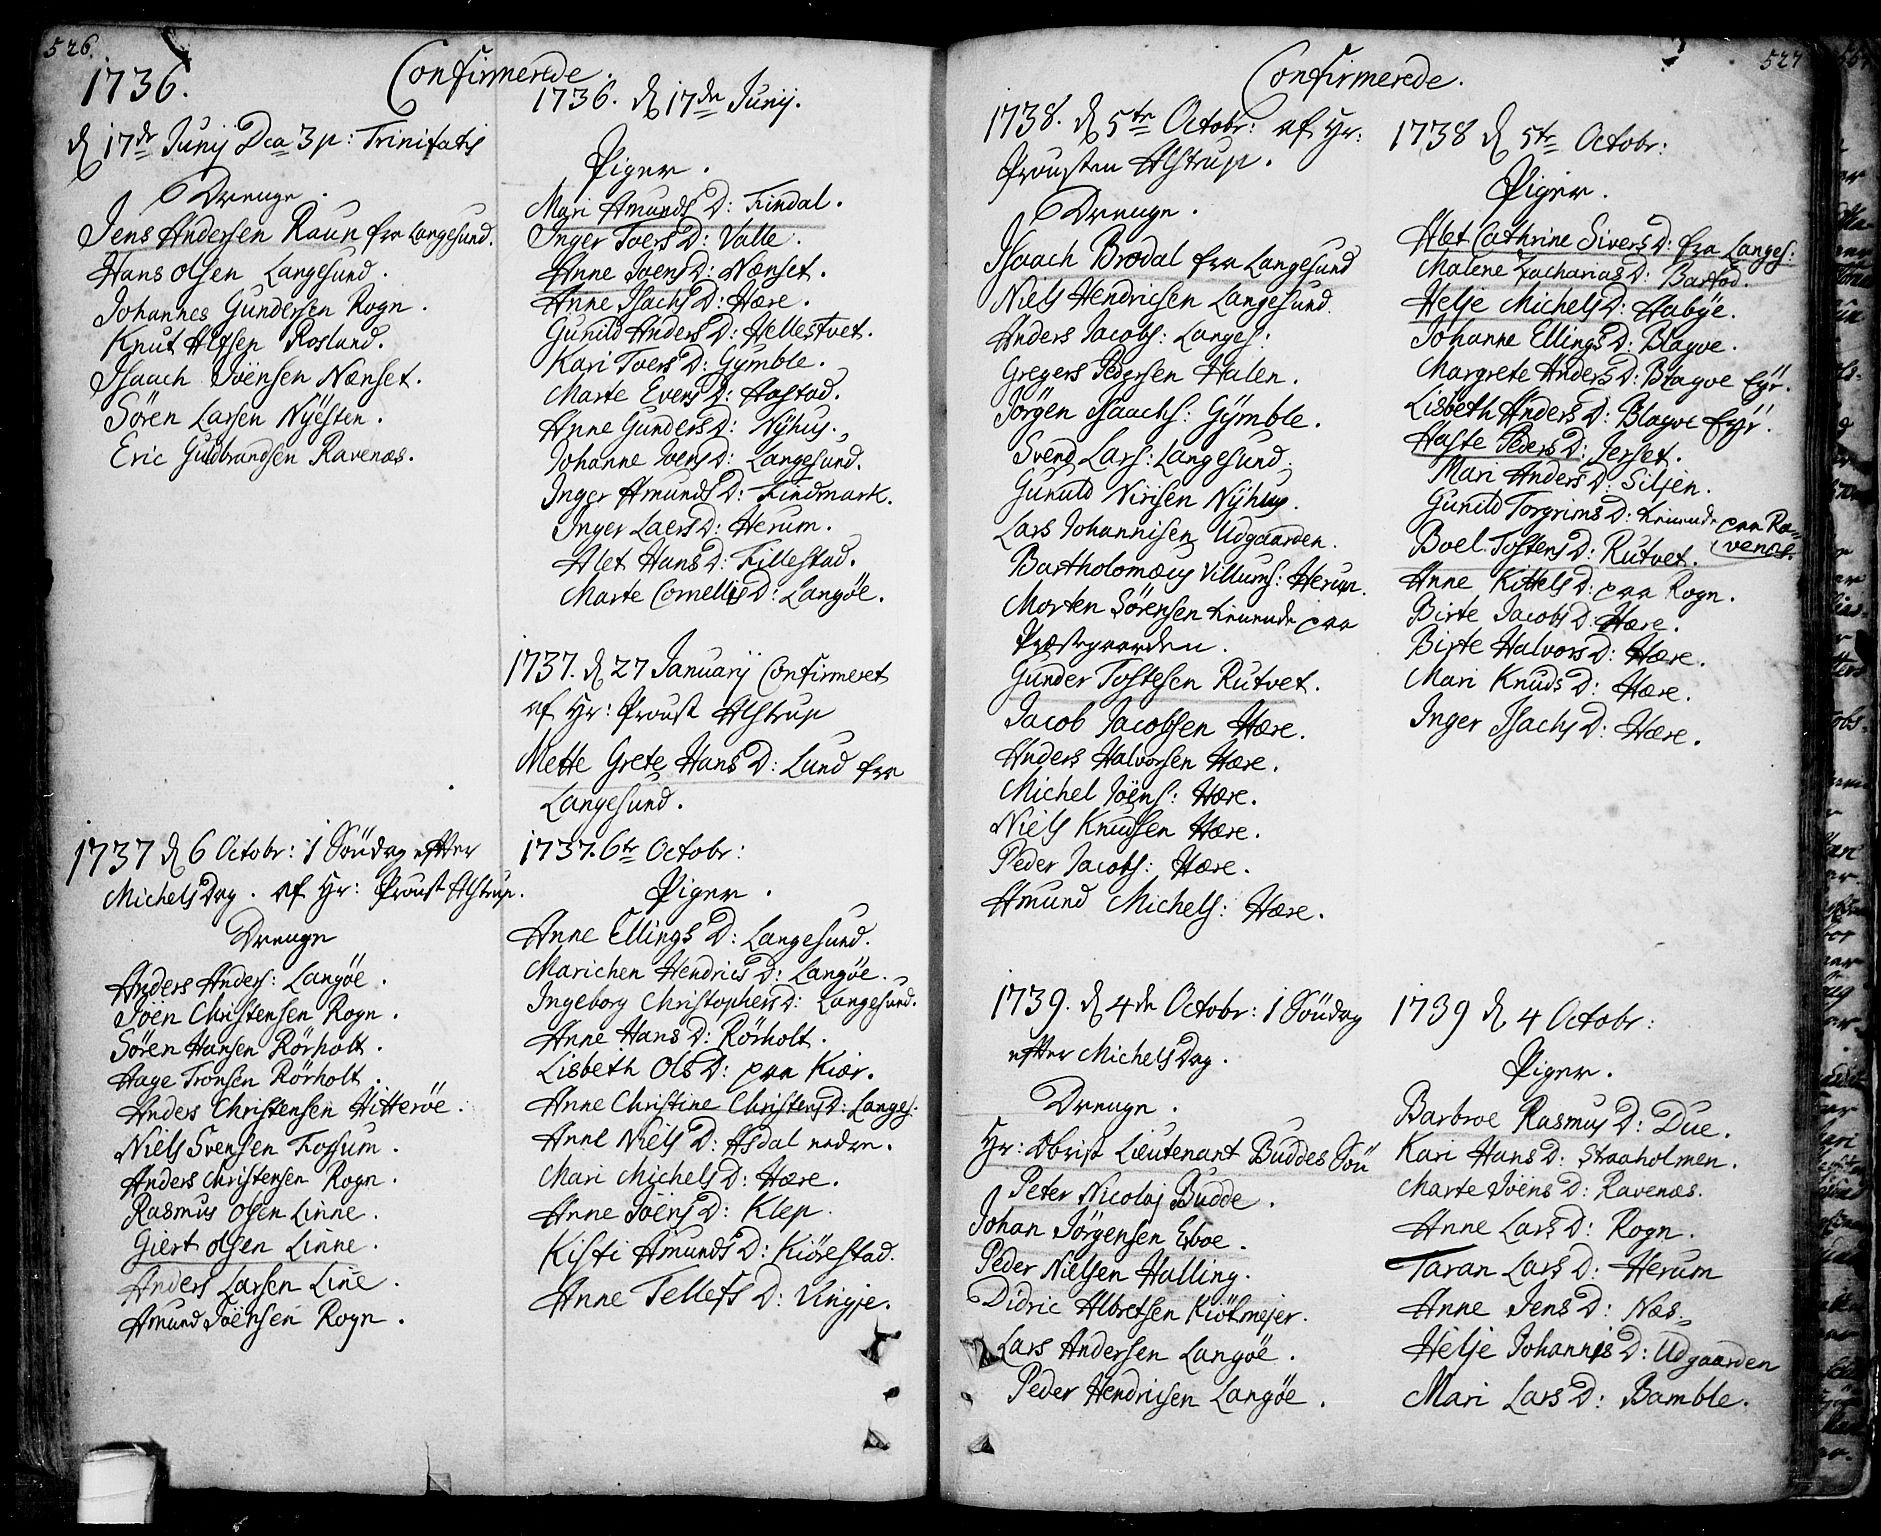 SAKO, Bamble kirkebøker, F/Fa/L0001: Ministerialbok nr. I 1, 1702-1774, s. 526-527